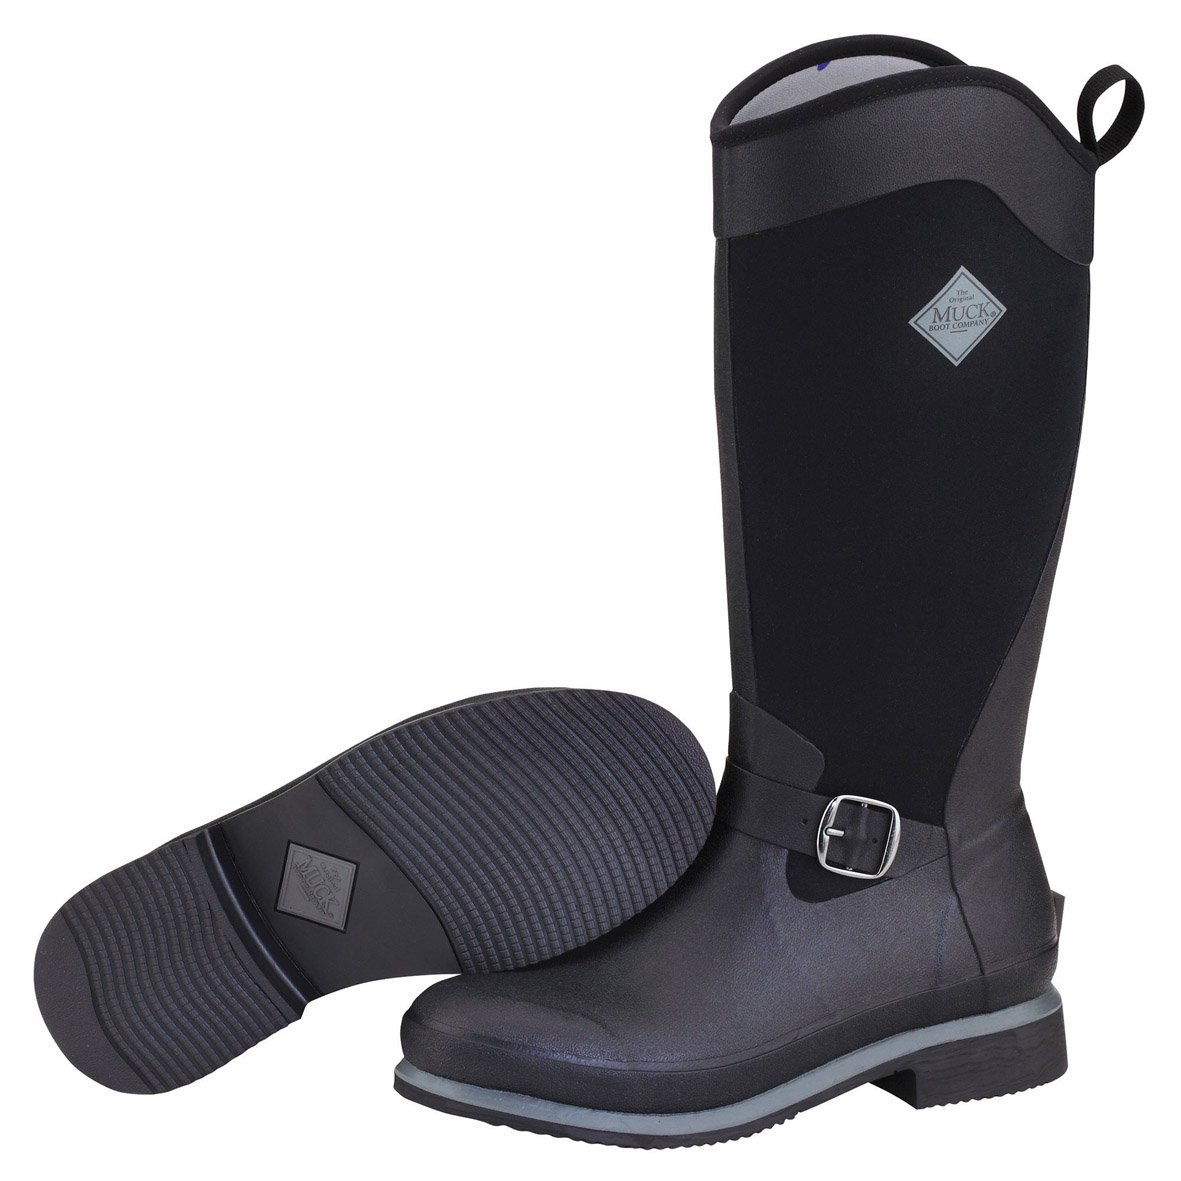 Muck Boot Reign Tall, Botas de equitació n para Mujer Botas de equitación para Mujer Muck Boots